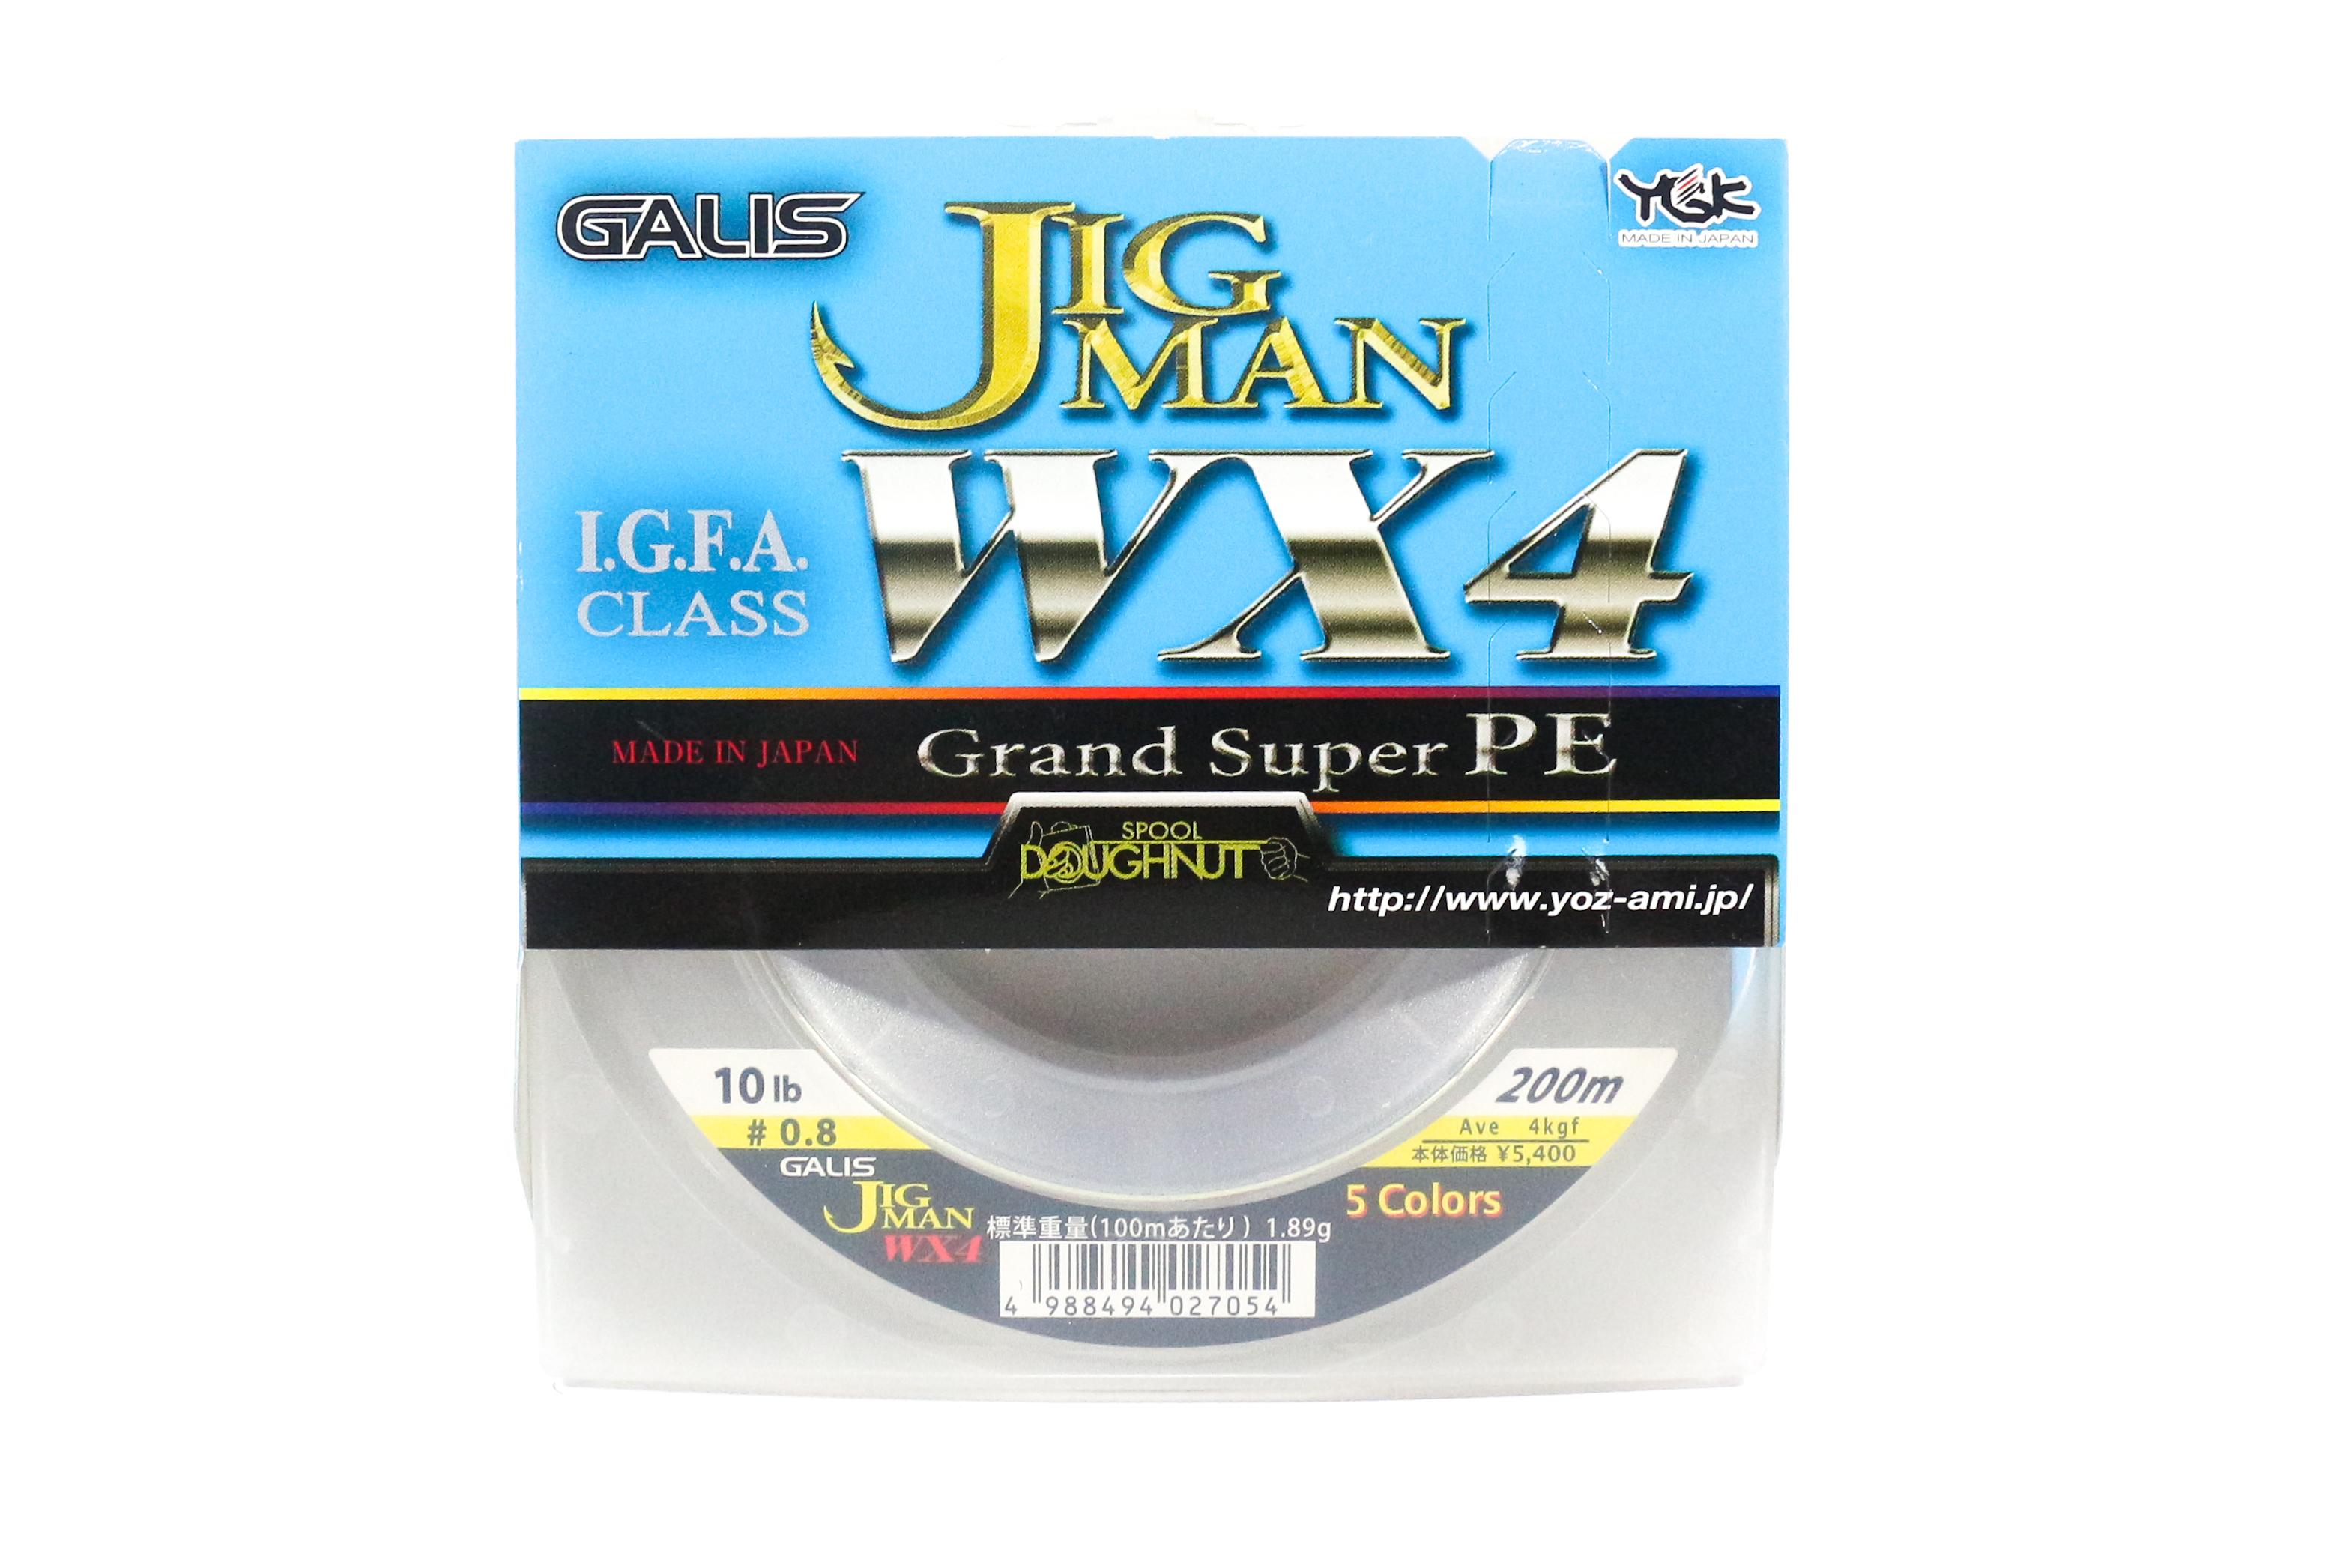 Sale YGK P.E Line Jigman WX4 Jig Man IGFA Class 200m 10lb (7054)